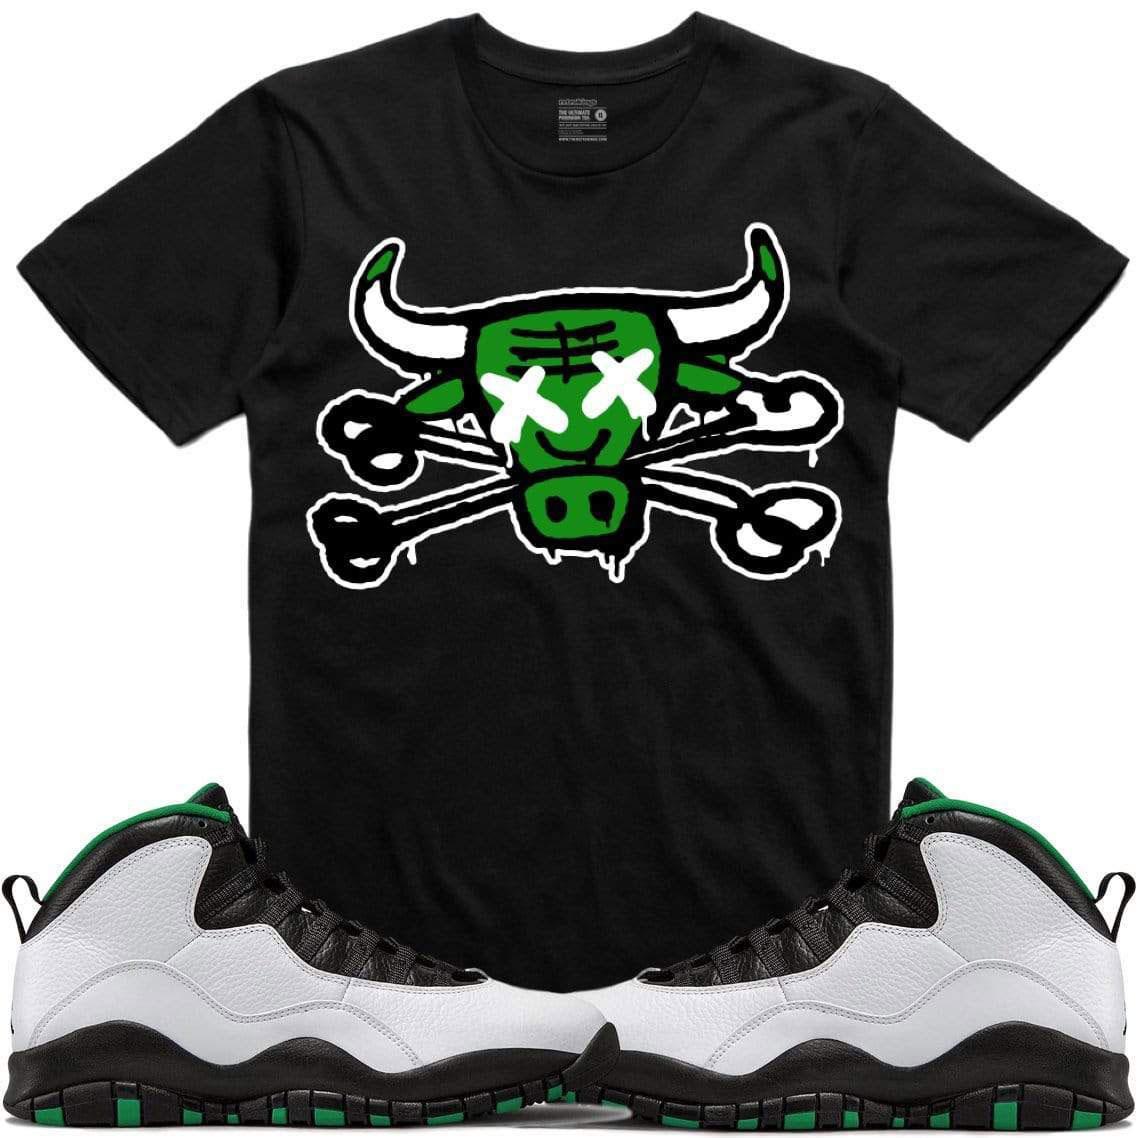 jordan-10-seattle-sneaker-shirts-retro-kings-3